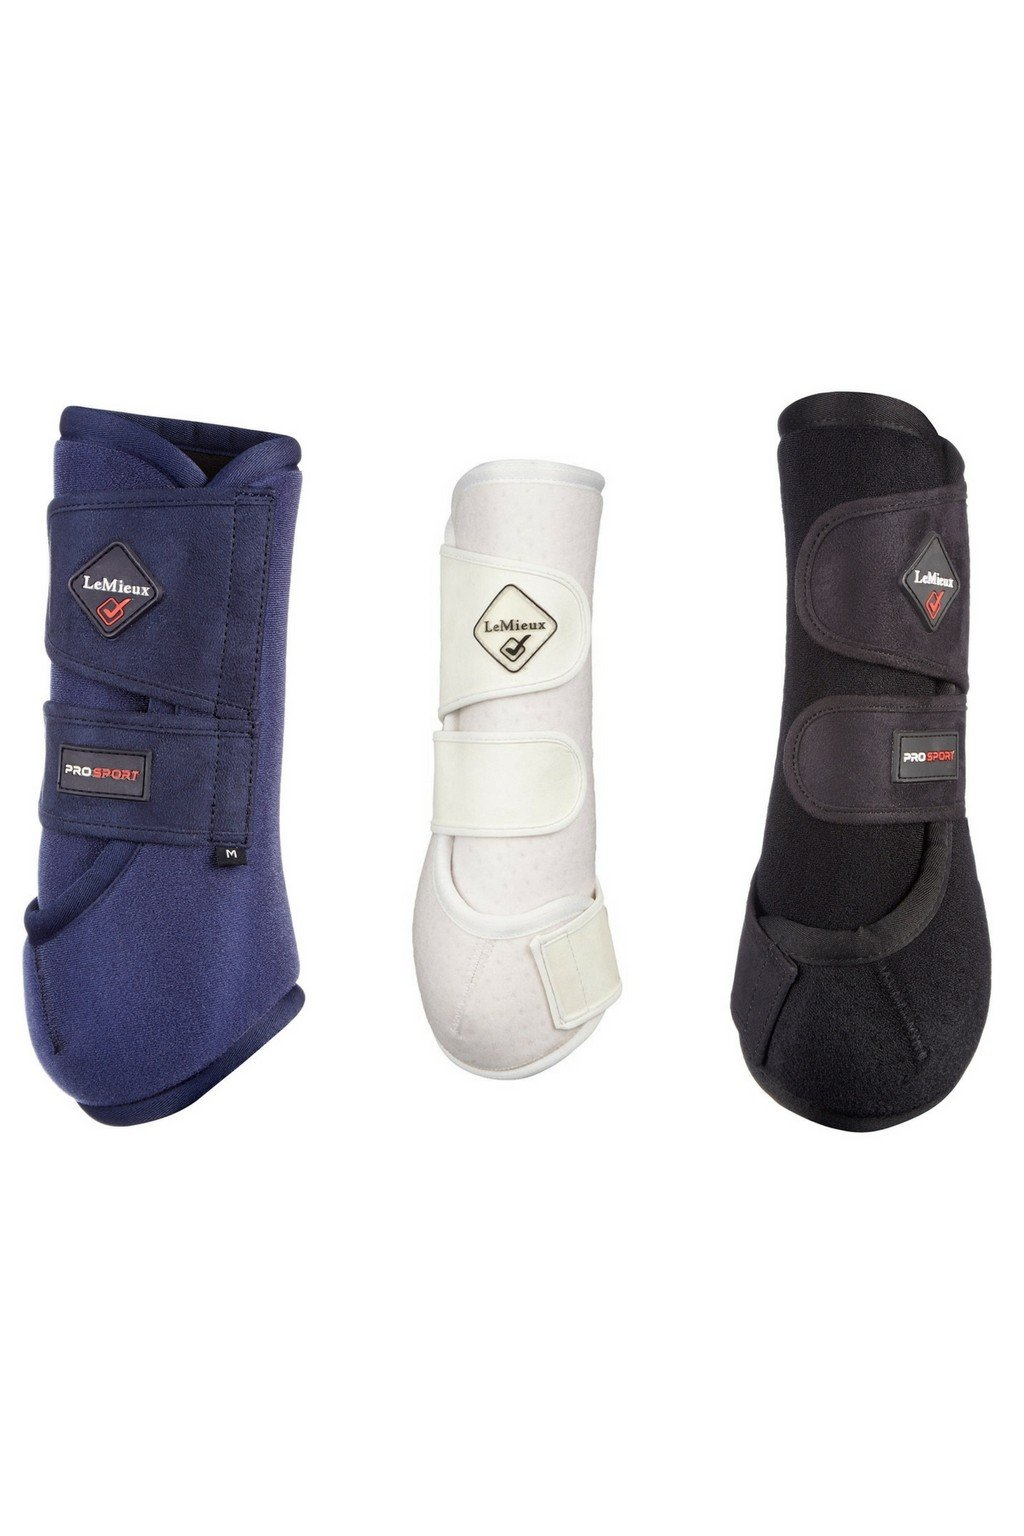 Kloubové kamaše LeMieux ProSport Support Boots